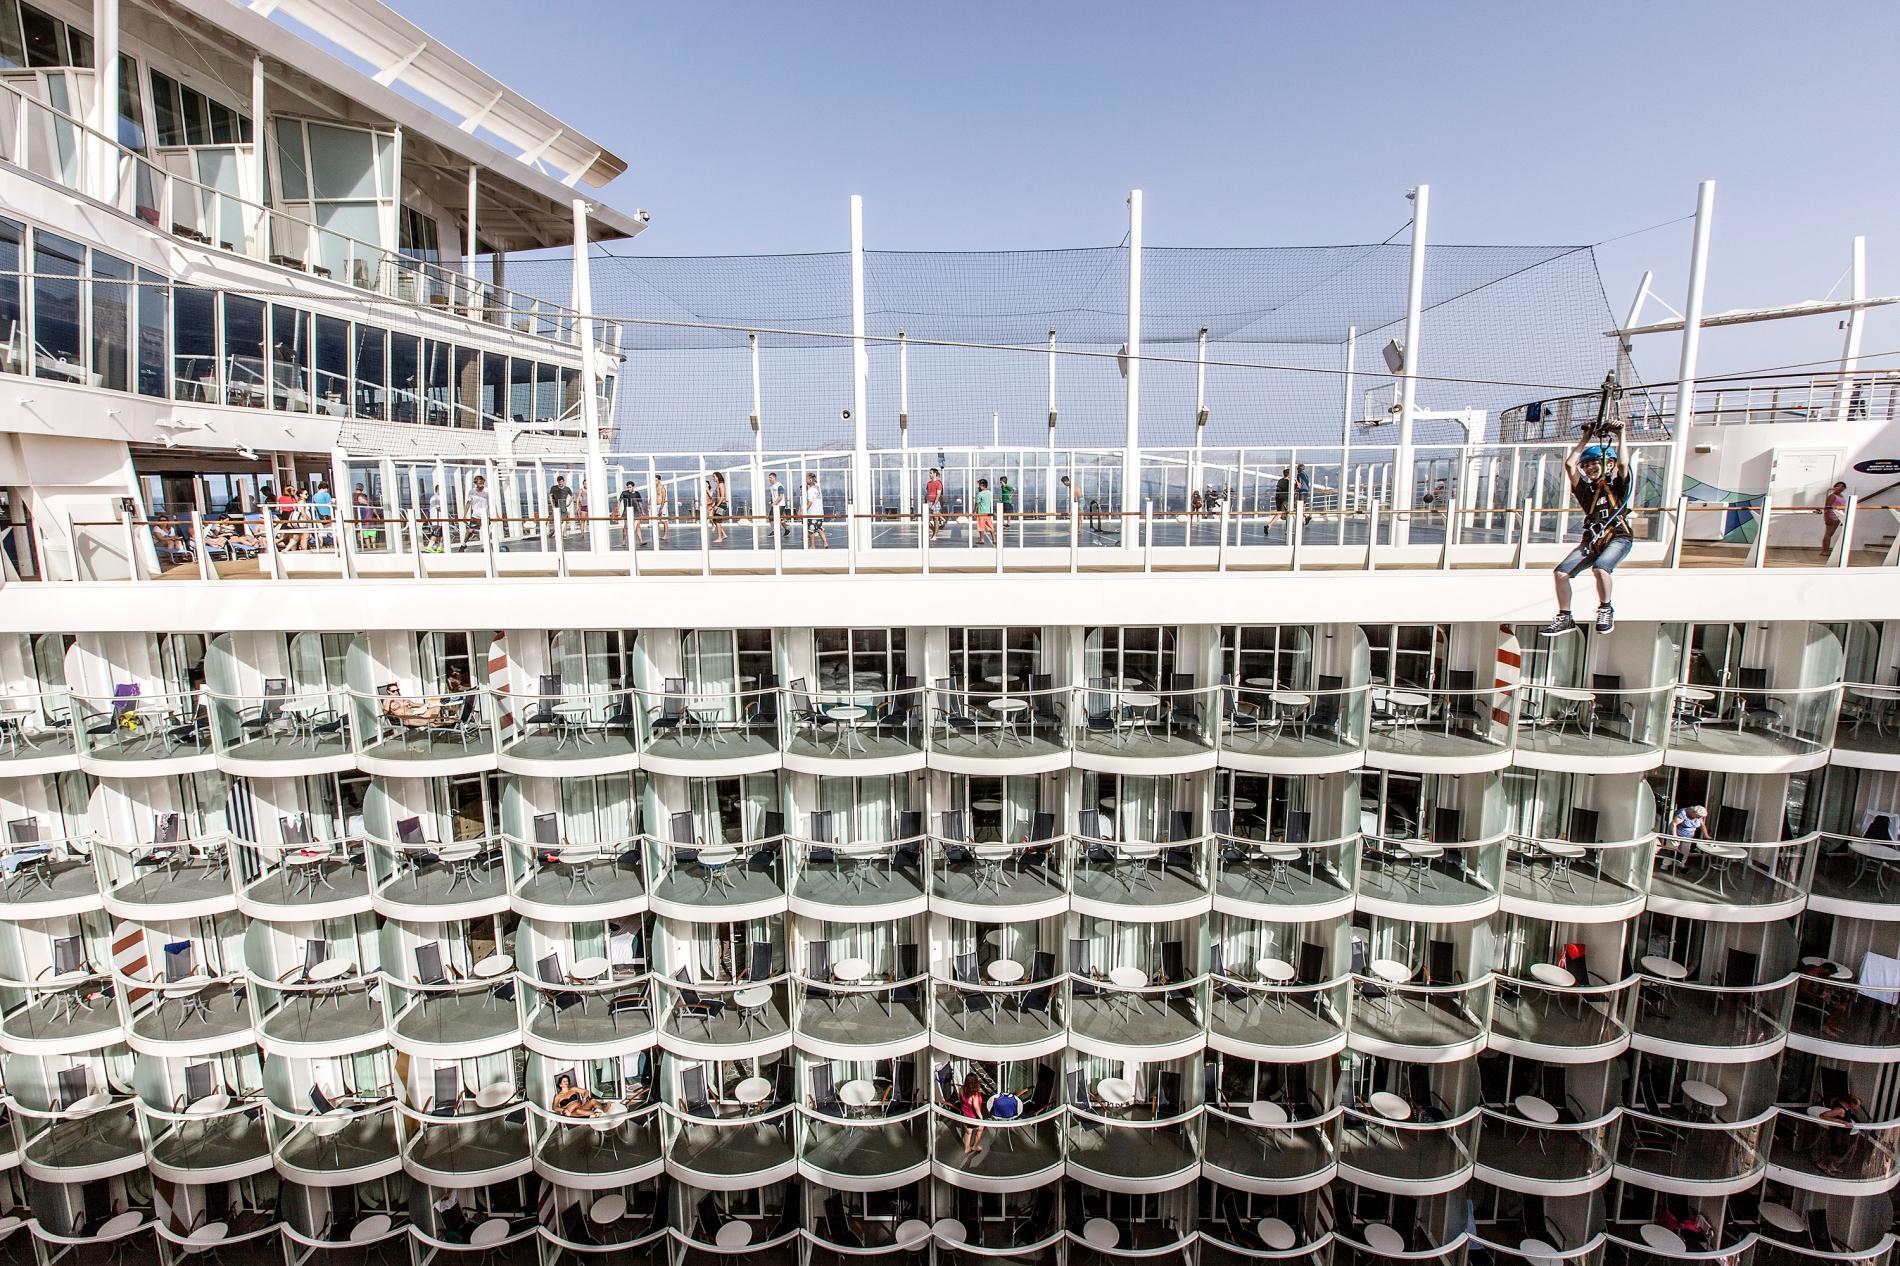 Harmony of the Seas, крупнейшее круизное судно, фотографии, Альберто Бернаскони, Alberto Bernasconi